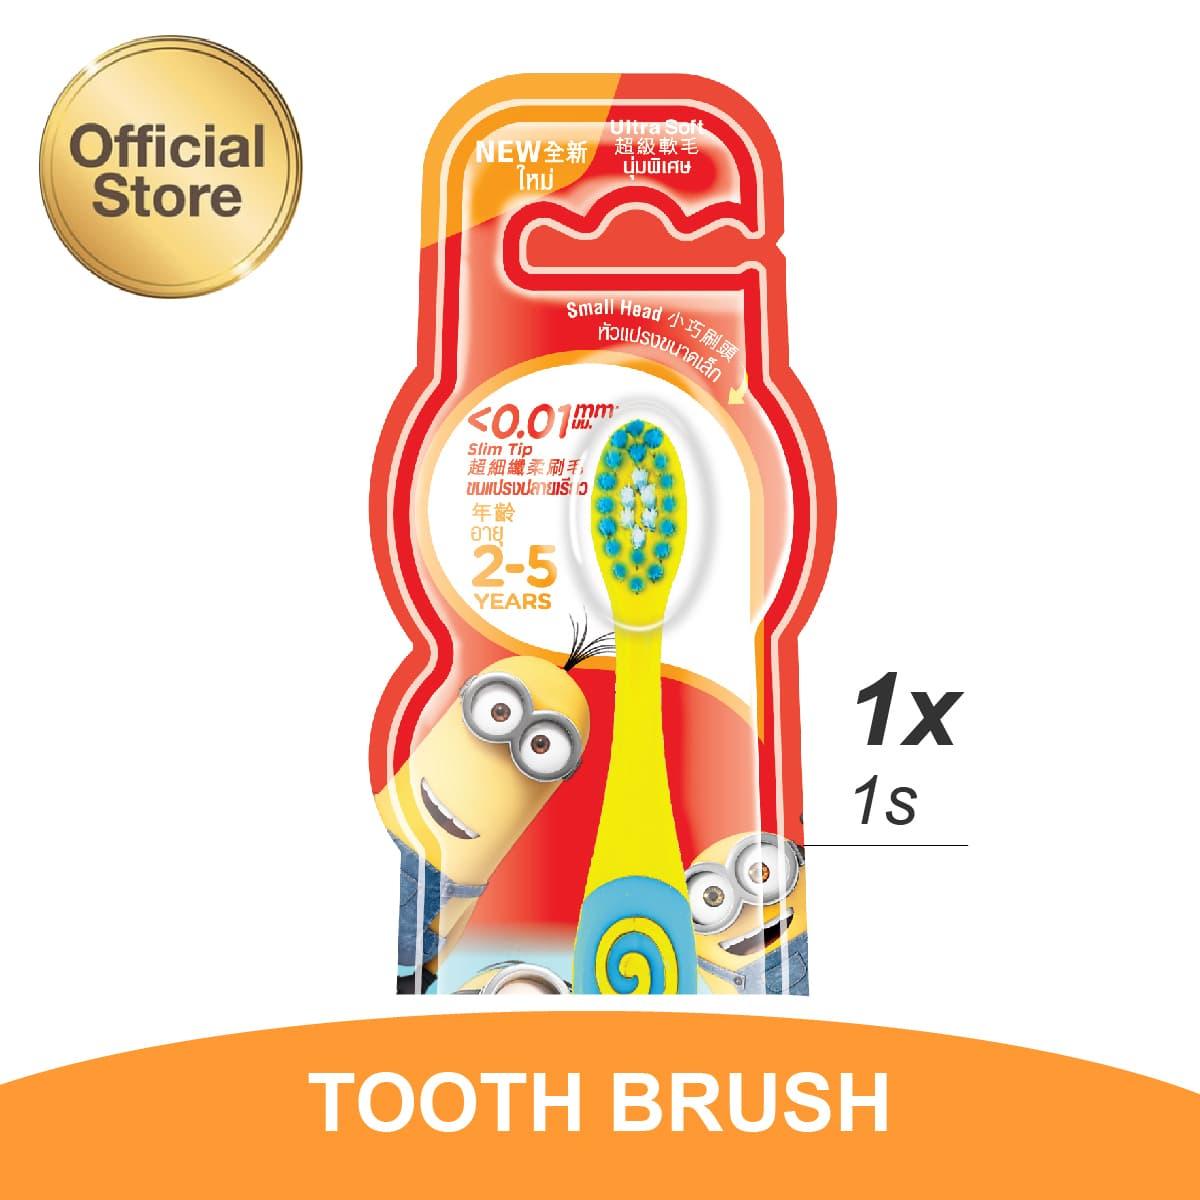 Colgate Slimsoft Compact Toothbrushsikat Gigi 1s 2 Pcs - Daftar ... b763119372